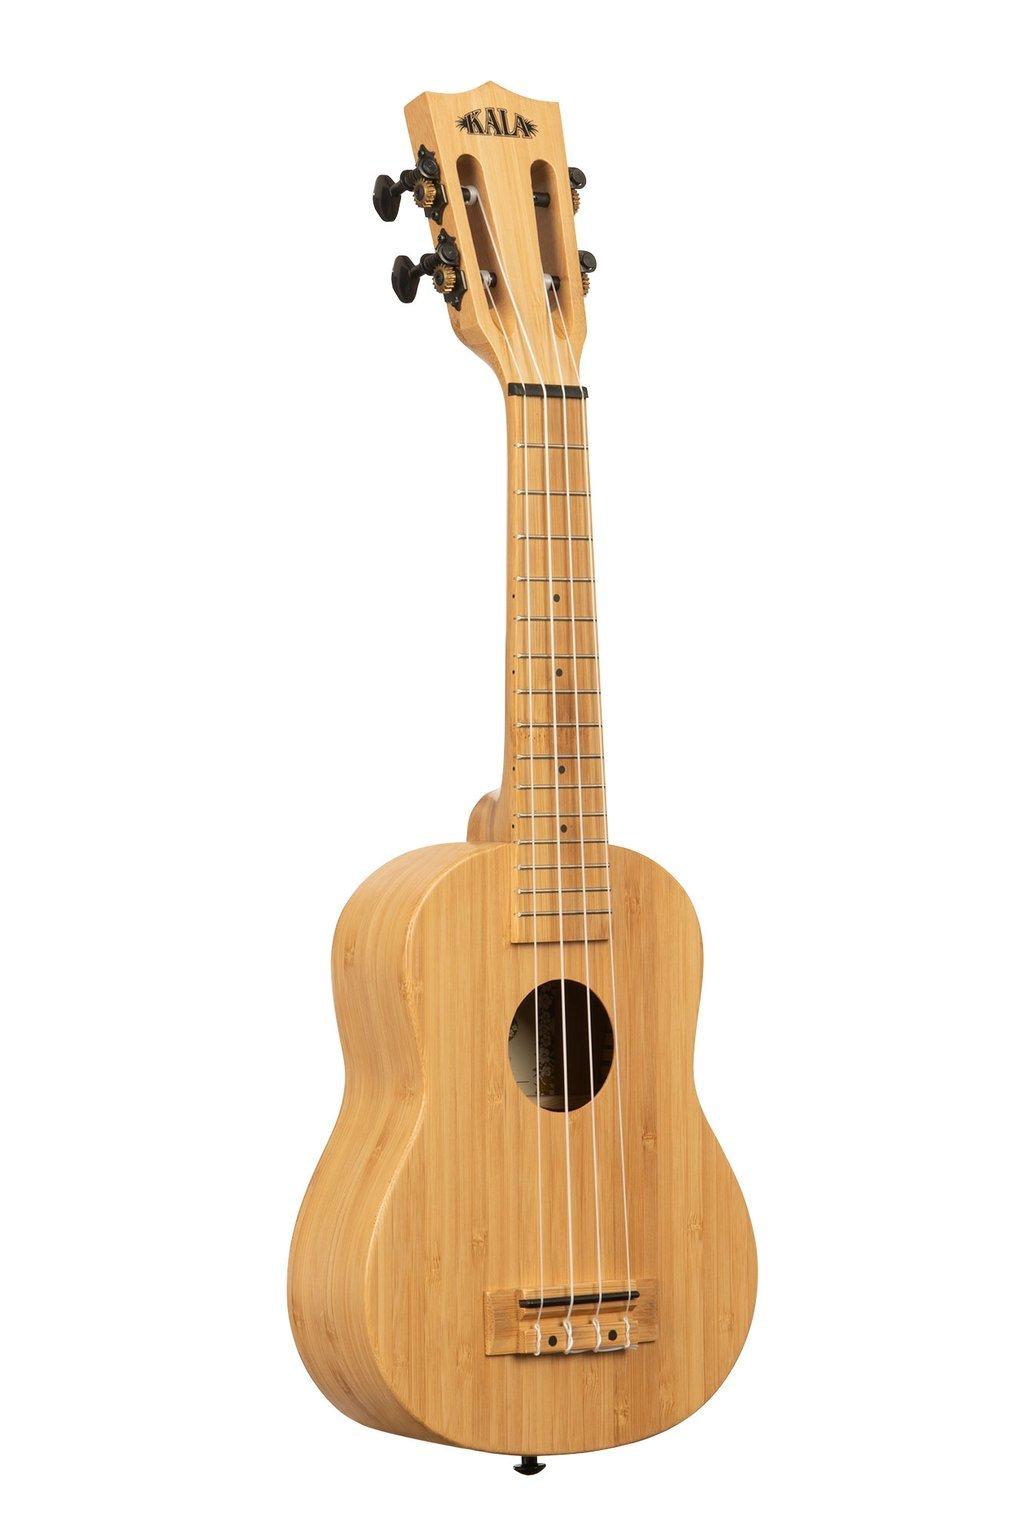 Kala KA-BMB-S Solid Bamboo Soprano Ukulele